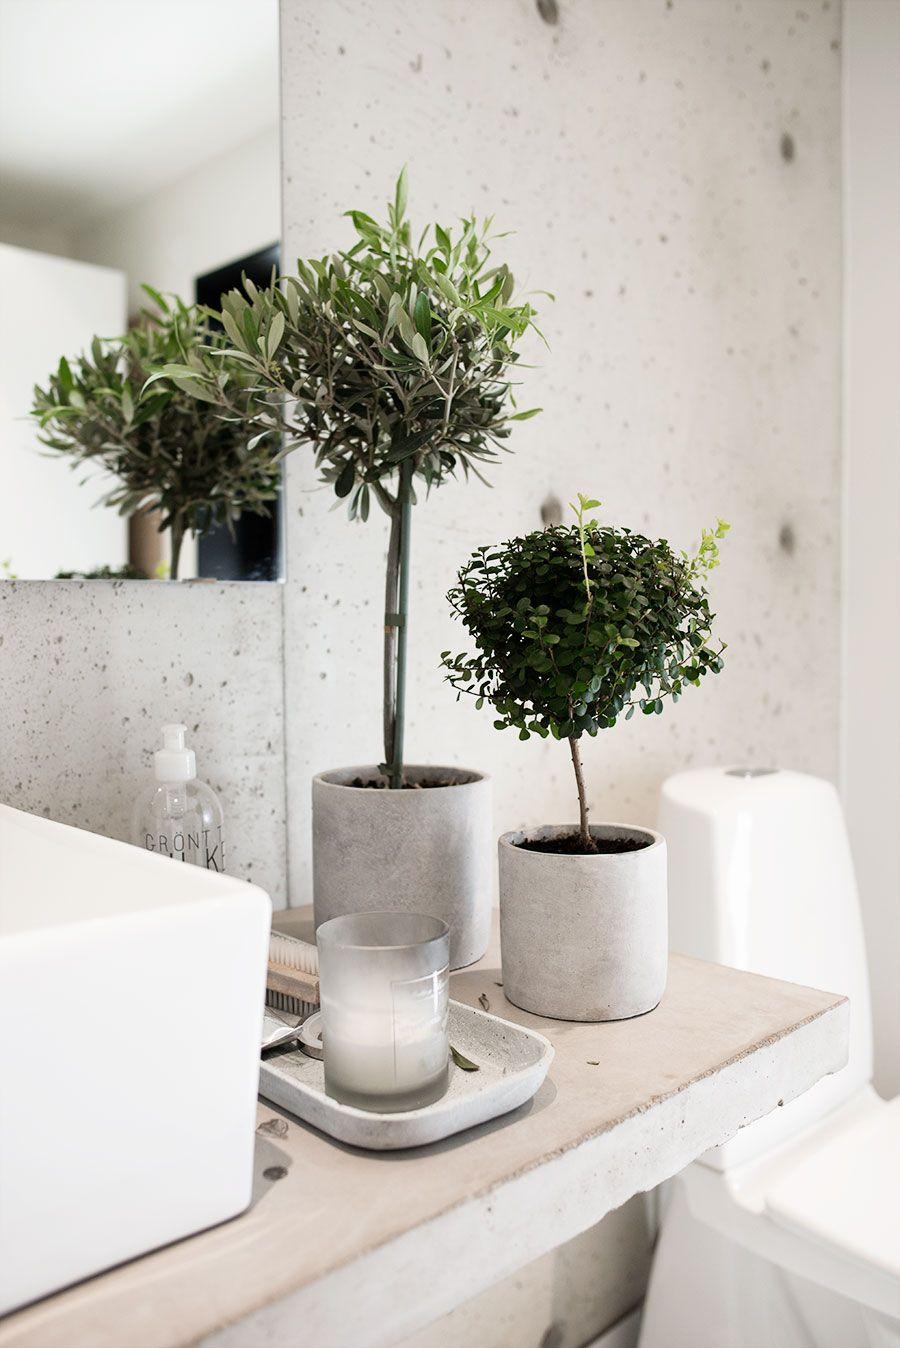 10x de mooiste badkamers met beton   planters, (2017) and a house